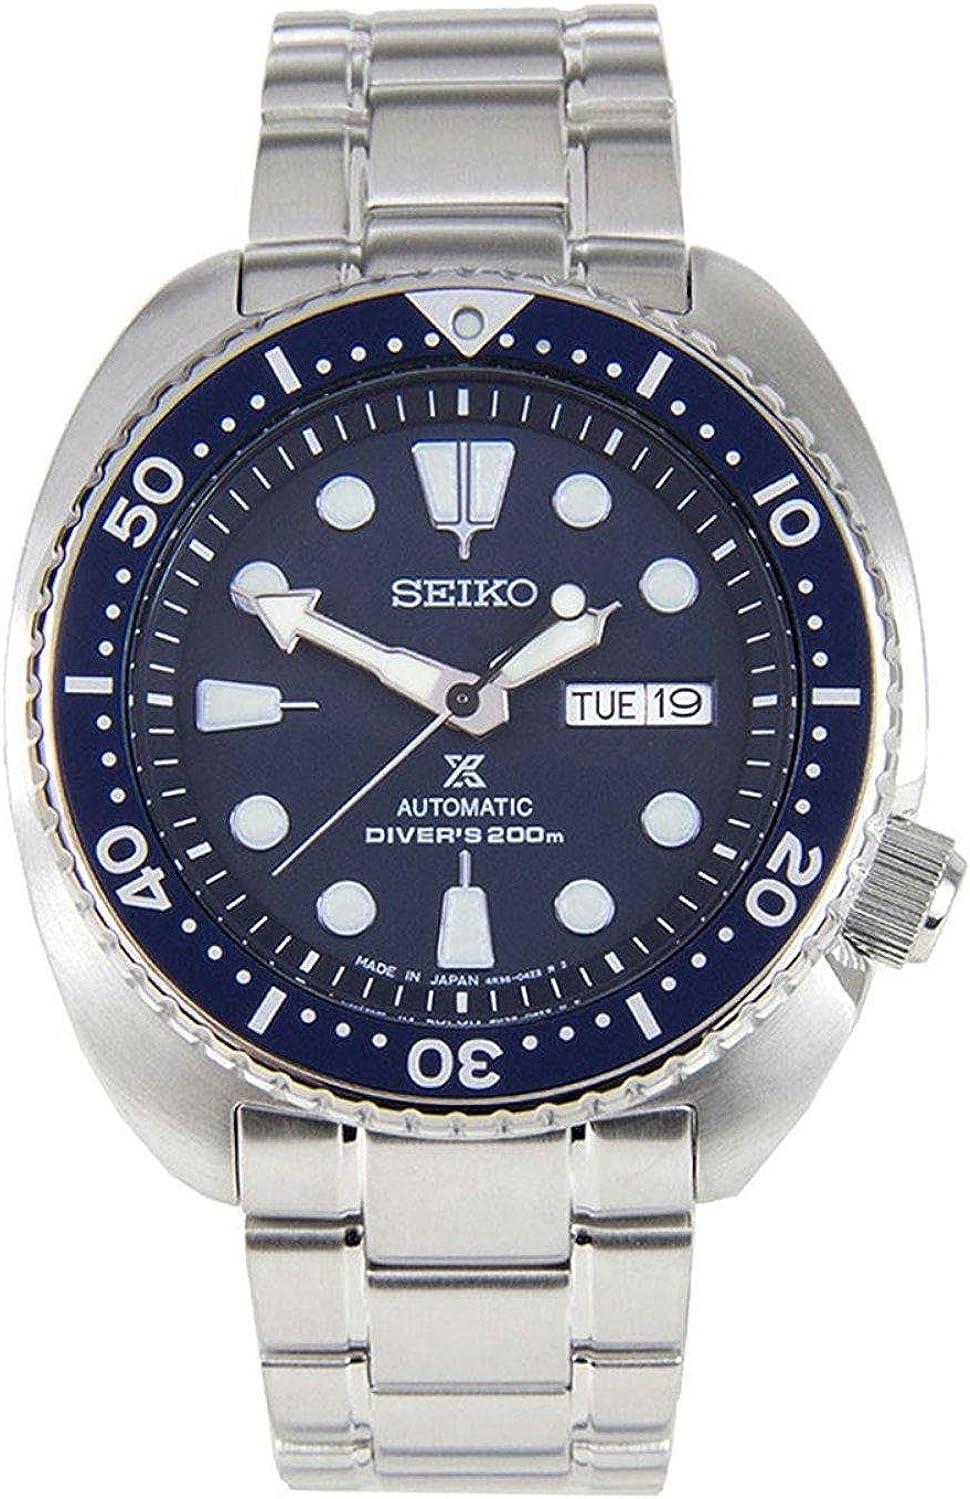 Seiko Men's SRP773J1 'Prospex' Stainless Steel Watch